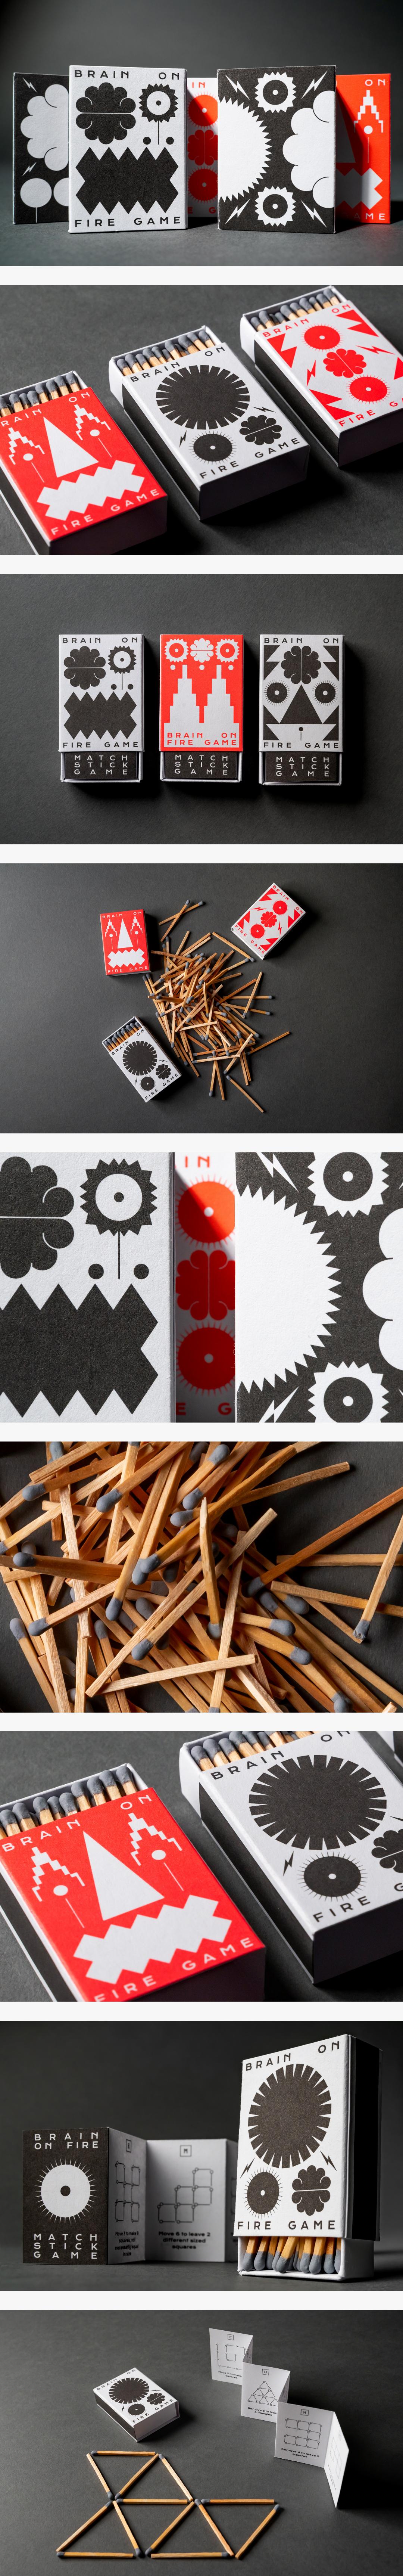 Crafts,Graphic Design,packaging Design